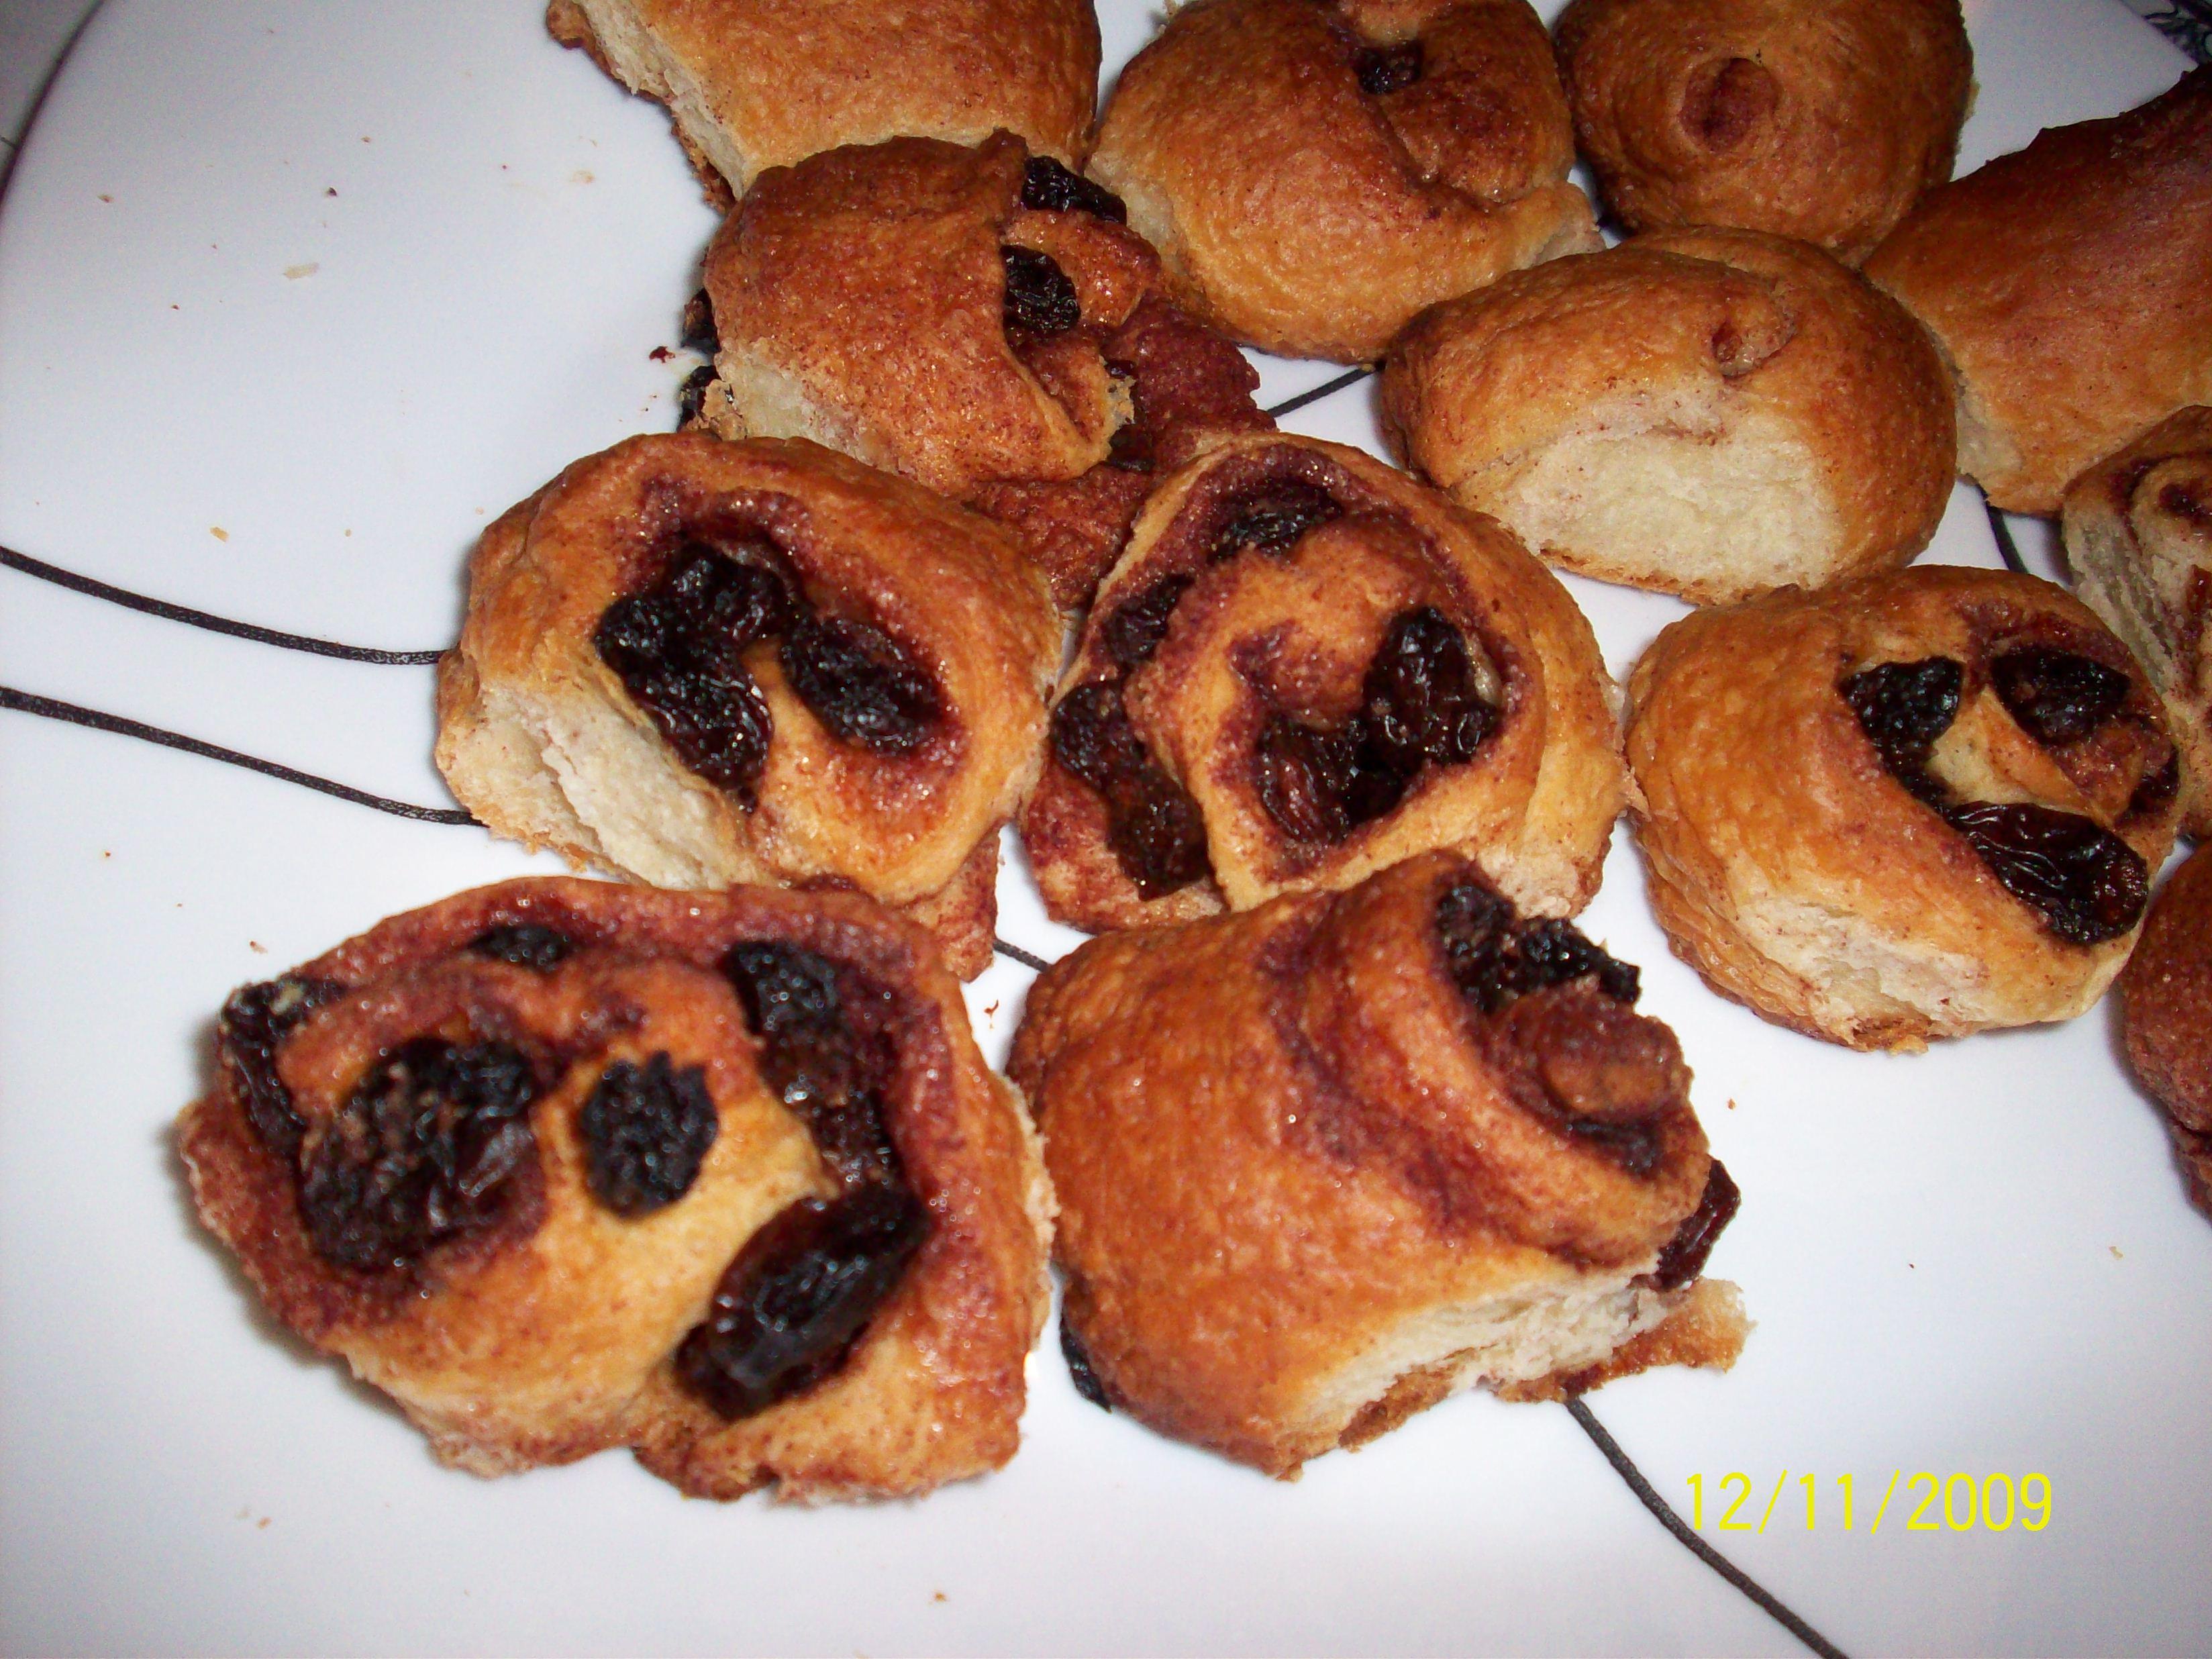 http://foodloader.net/cutie_2009-11-12_Mini_Cinnamon_Crescents2.jpg